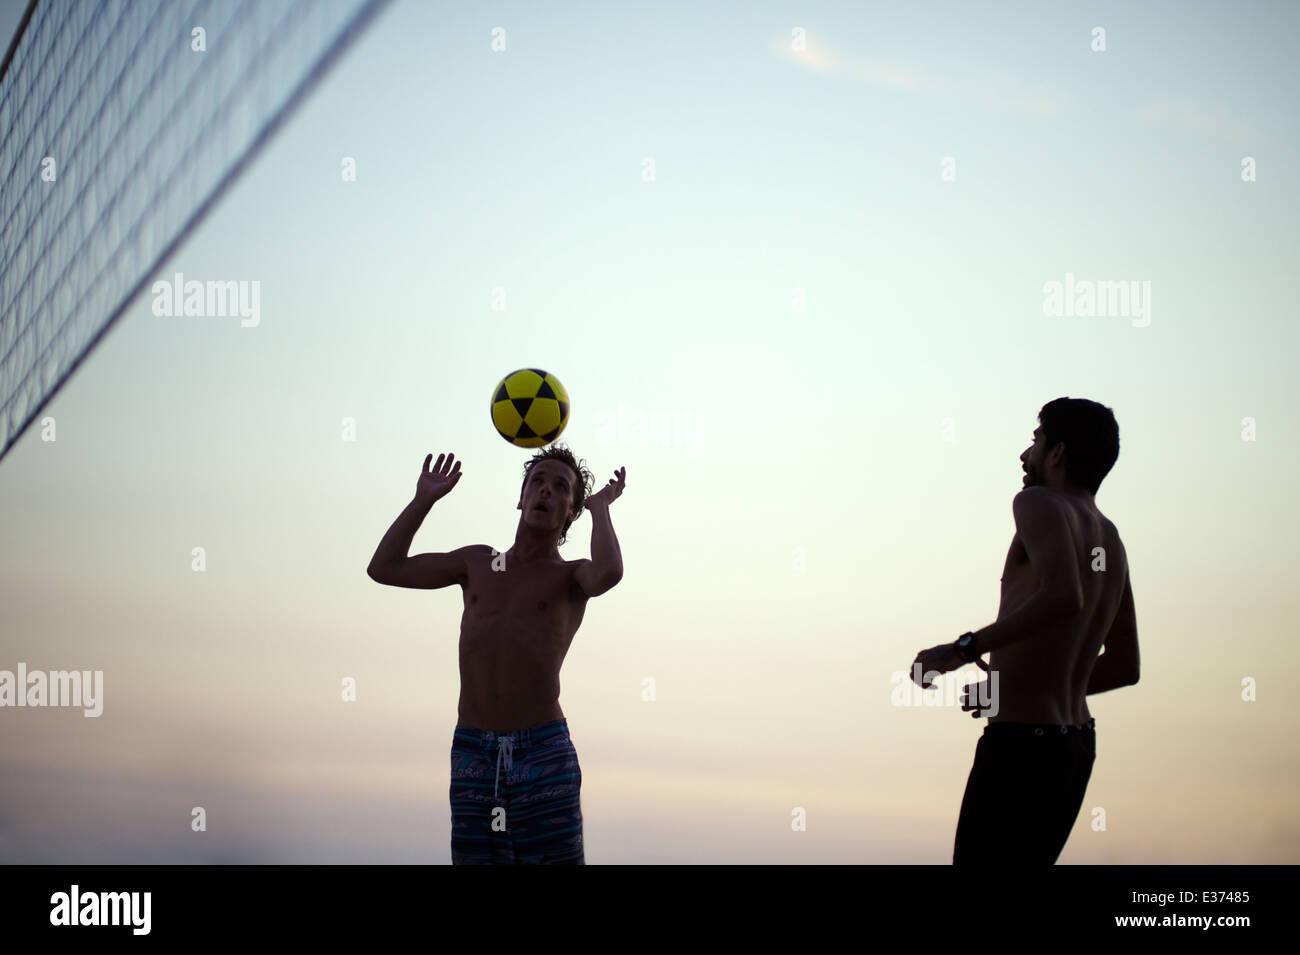 RIO DE JANEIRO, BRAZIL - FEBRUARY 11, 2014: Brazilian men on Ipanema Beach playing footvolley, a football volleyball - Stock Image